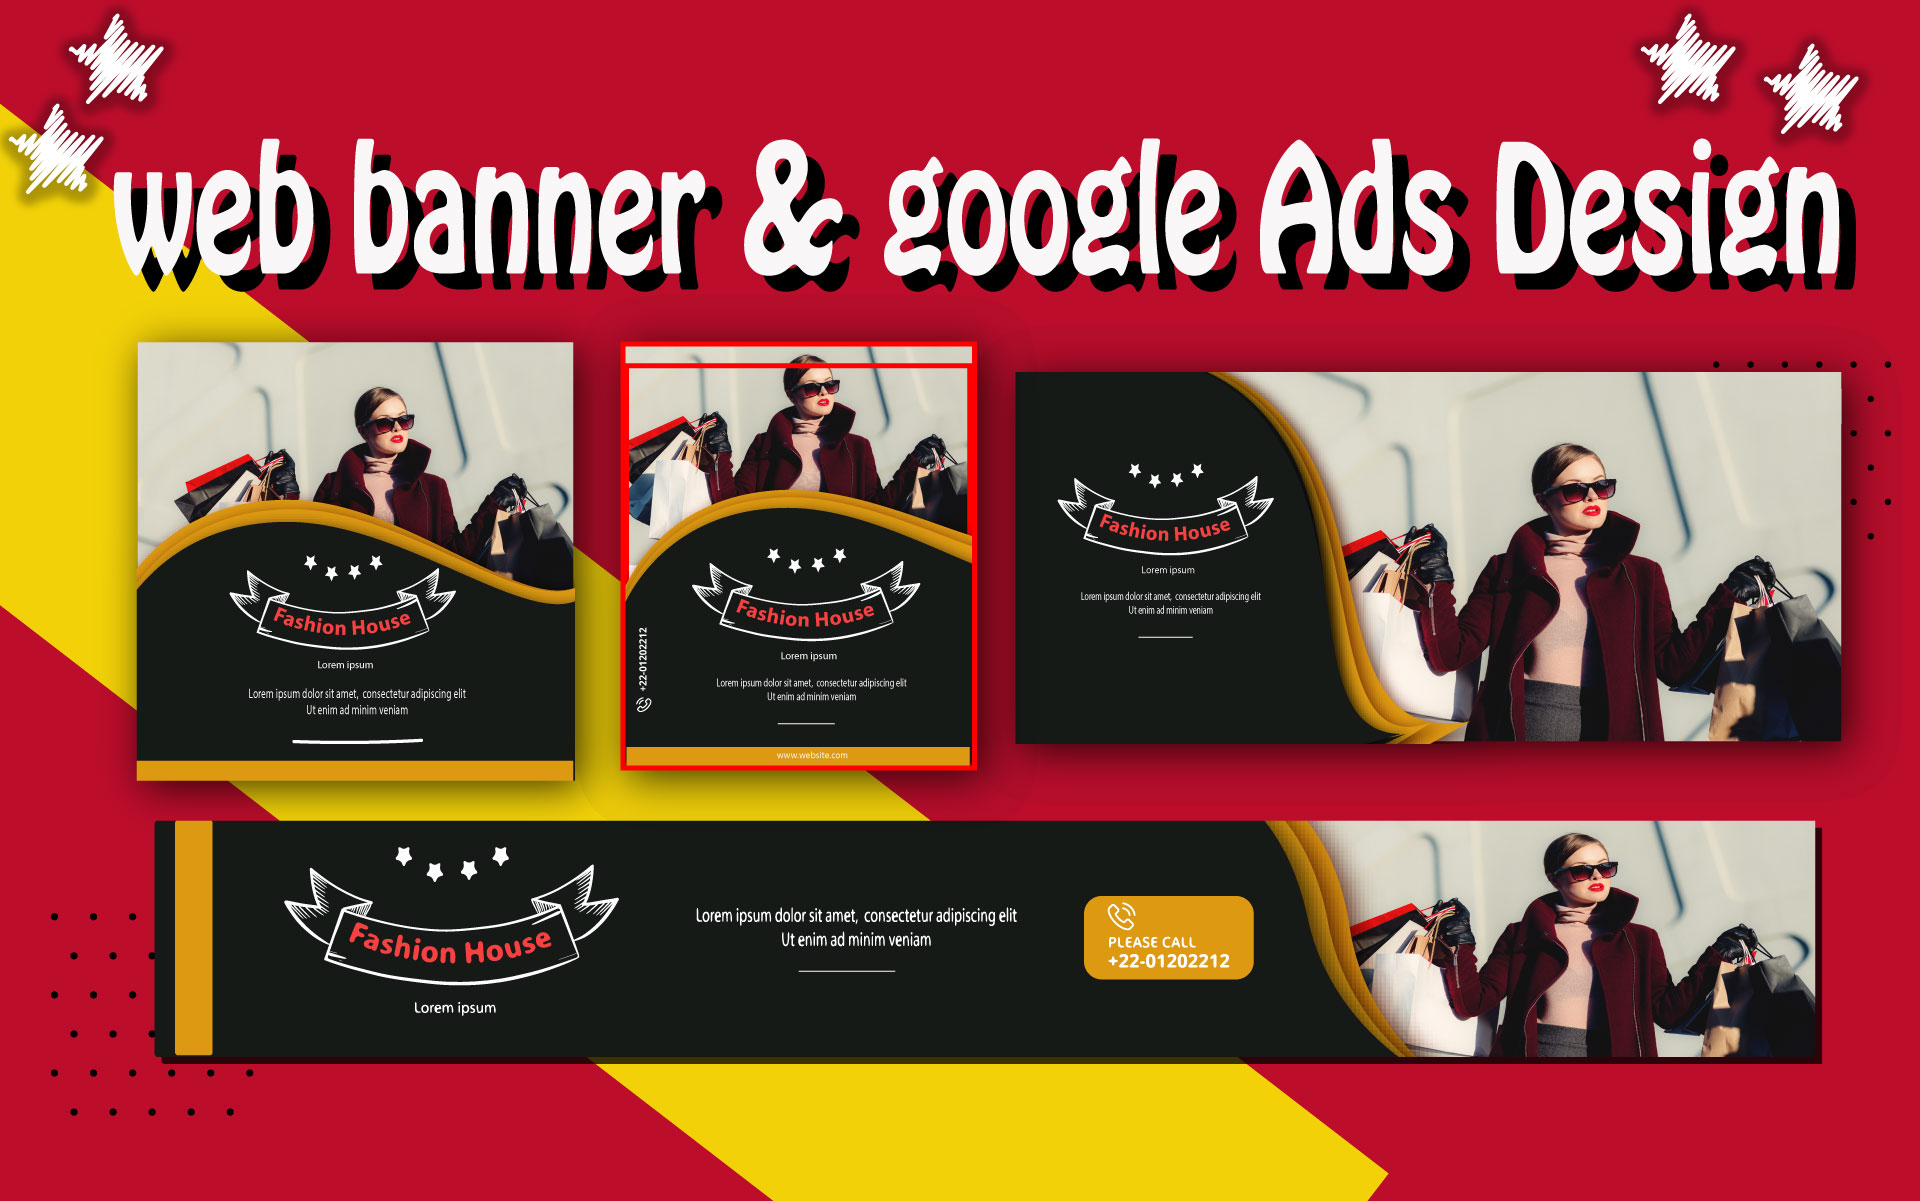 I will do web banner ads, google display ads design